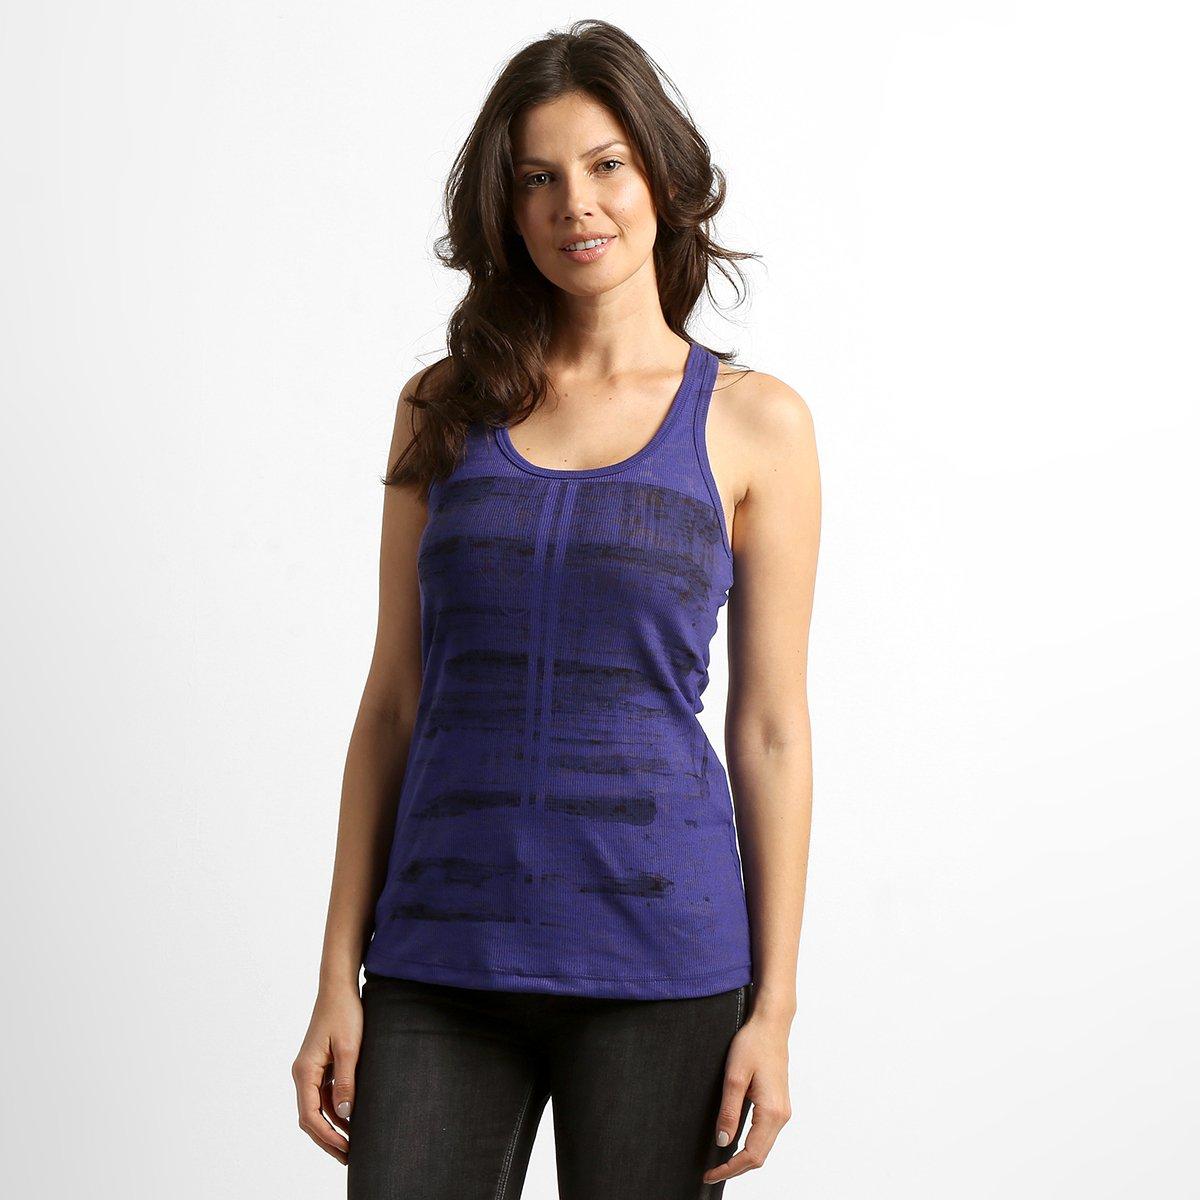 b162bff76f Regata Calvin Klein Jeans - Compre Agora